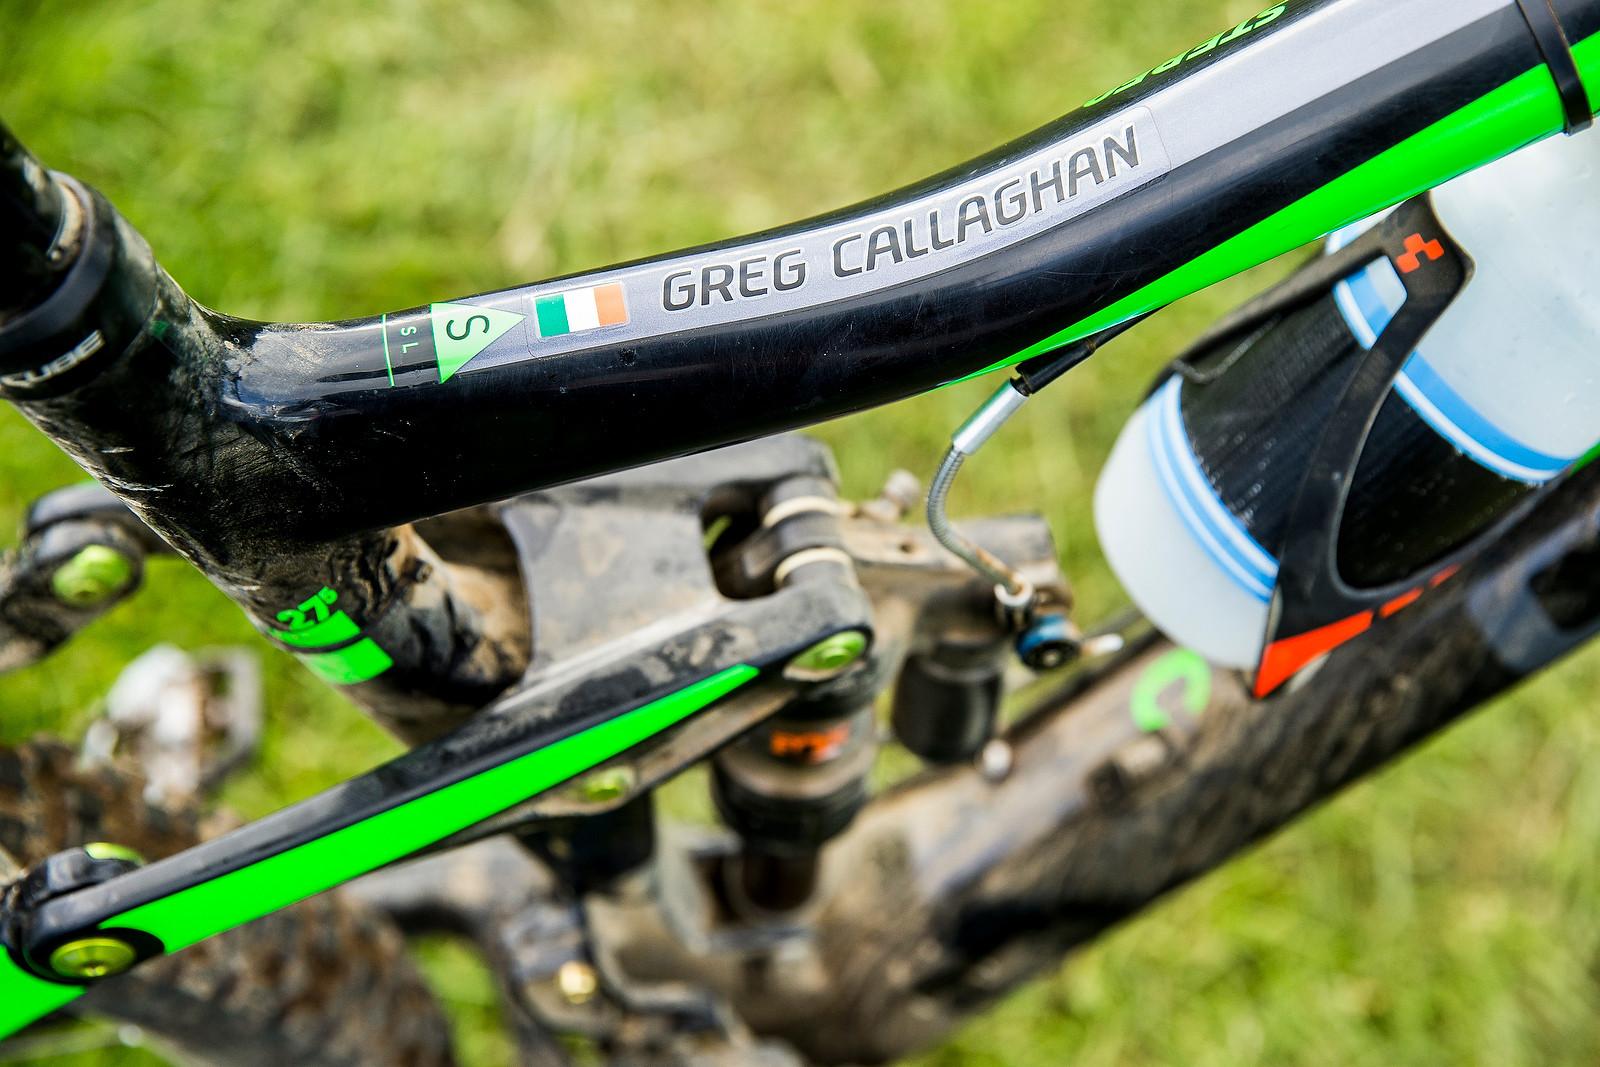 WINNING BIKE: Greg Callaghan's Cube Stereo 140 Super HPC SL 27.5 - WINNING BIKE: Greg Callaghan's Cube Stereo 140 Super HPC SL 27.5 - Mountain Biking Pictures - Vital MTB